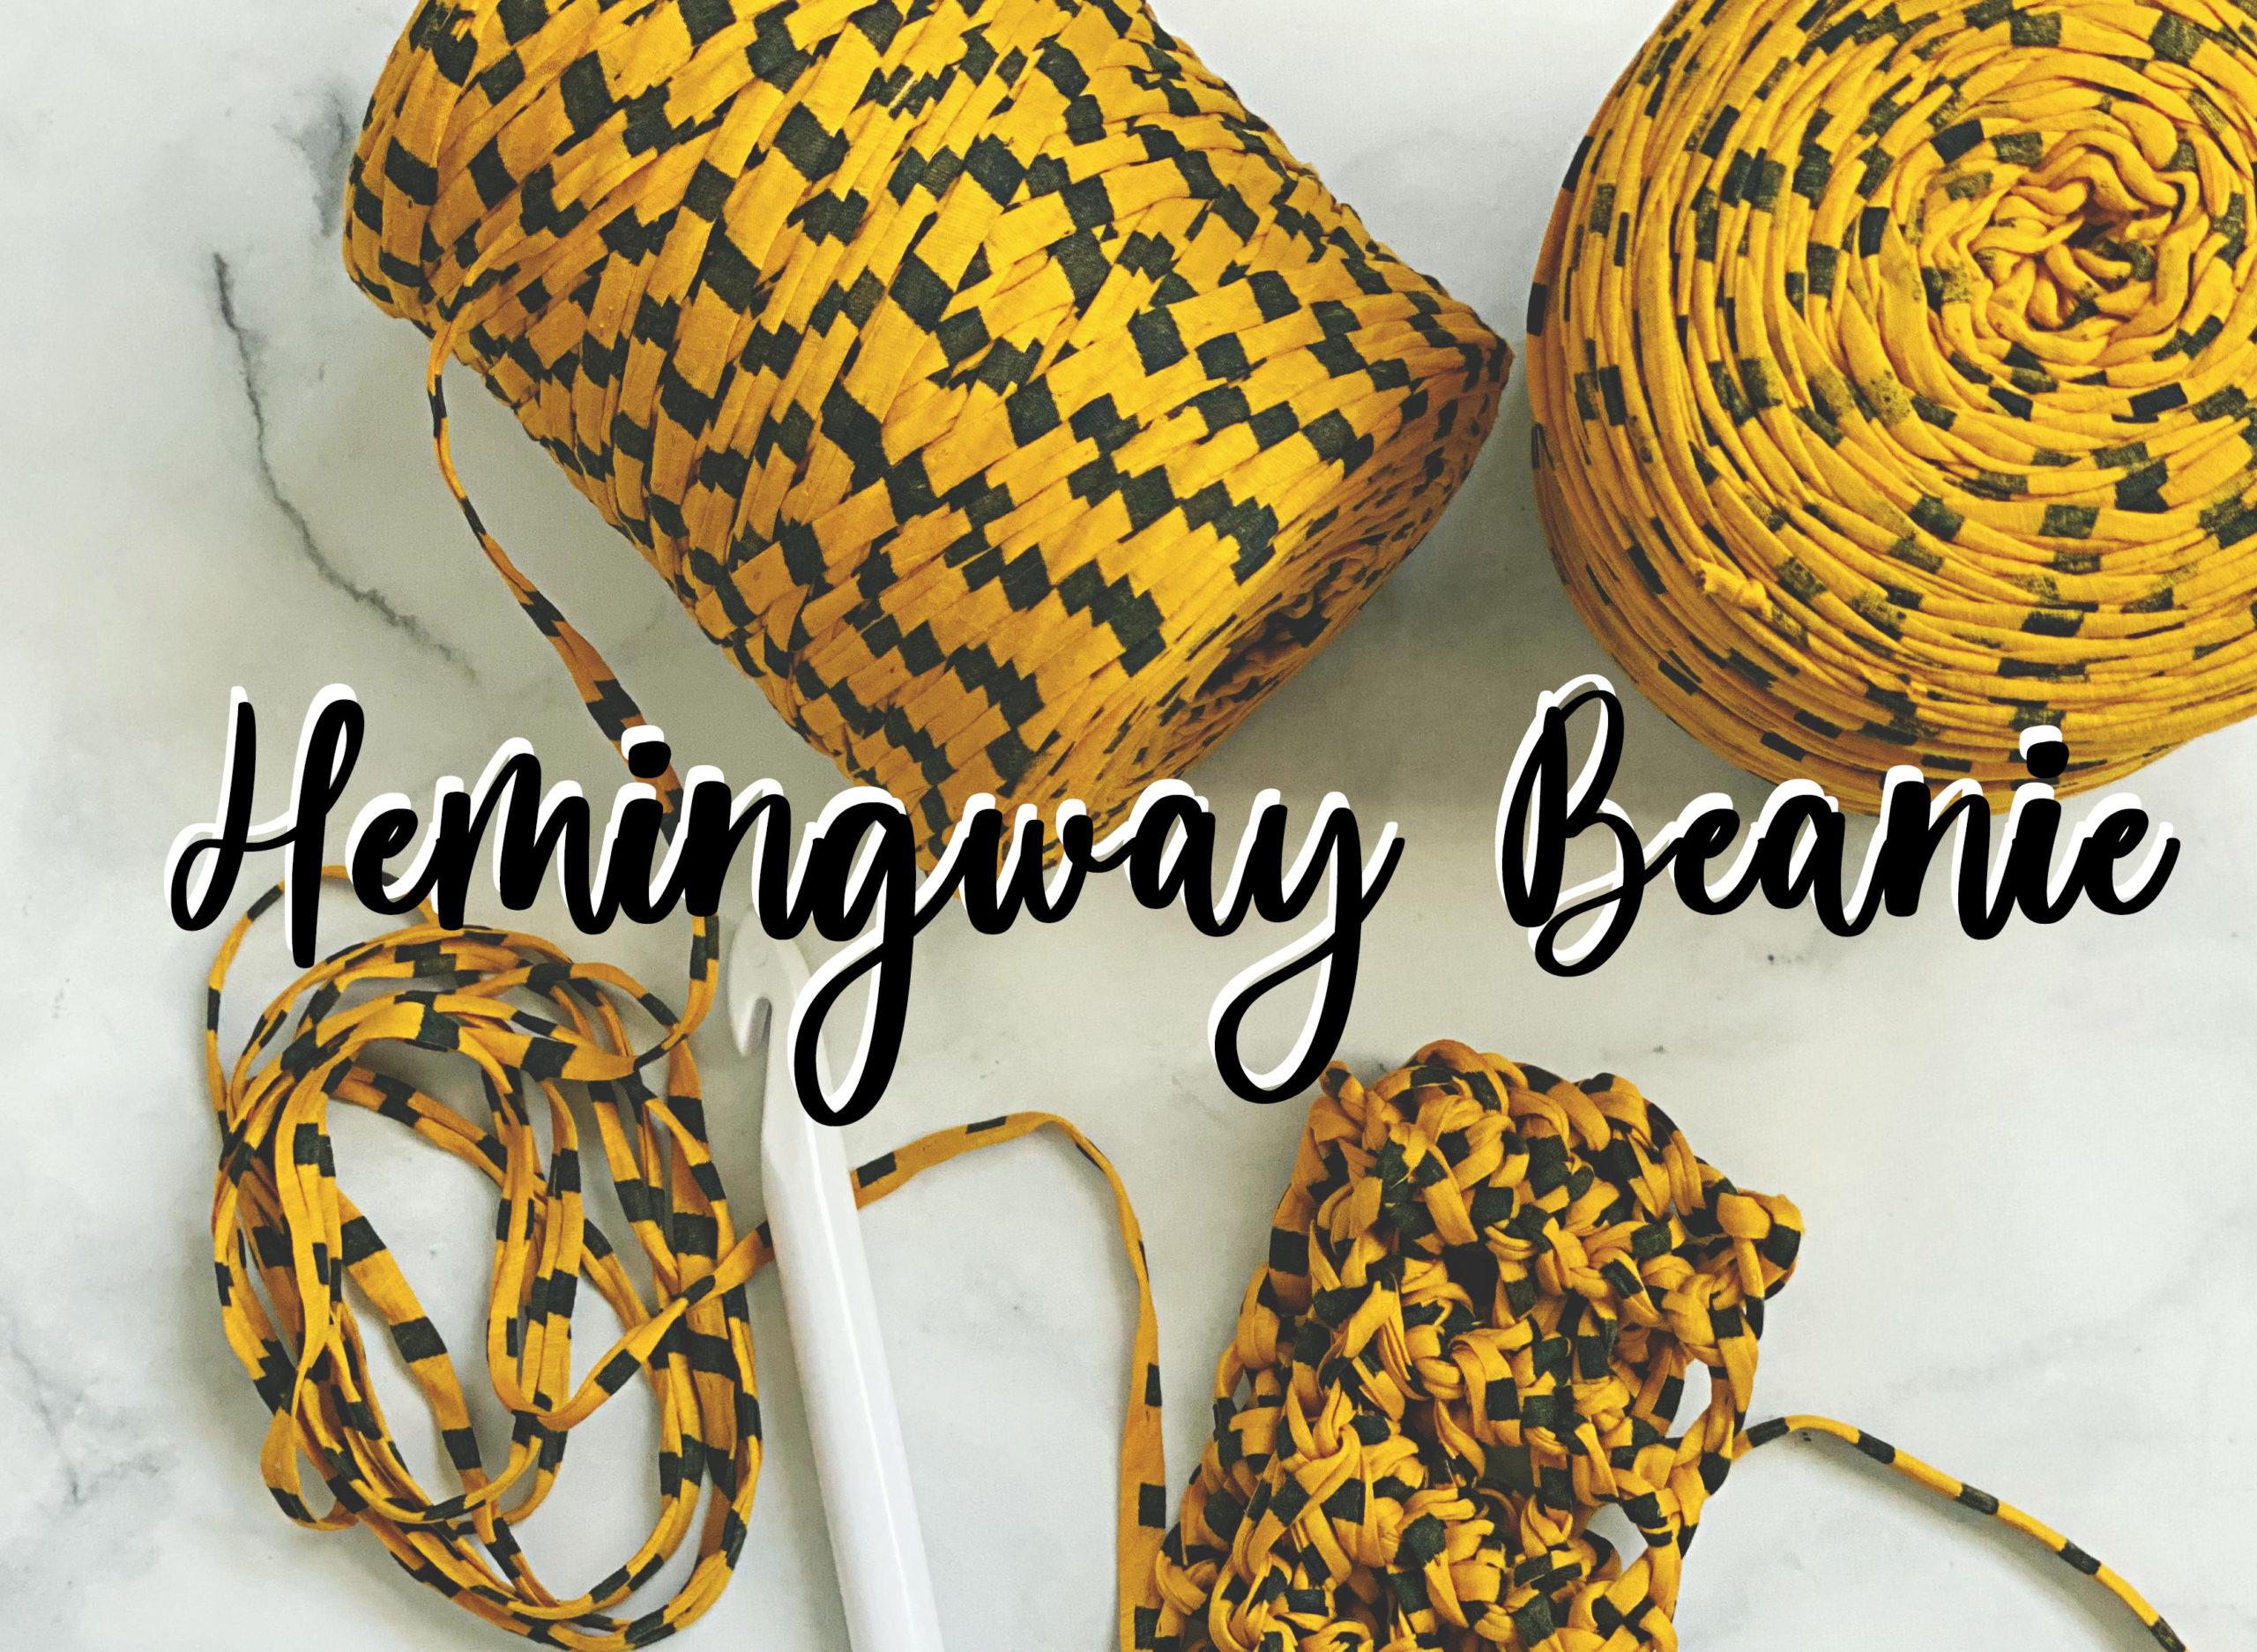 Friday: Hemingway Beanie Hat